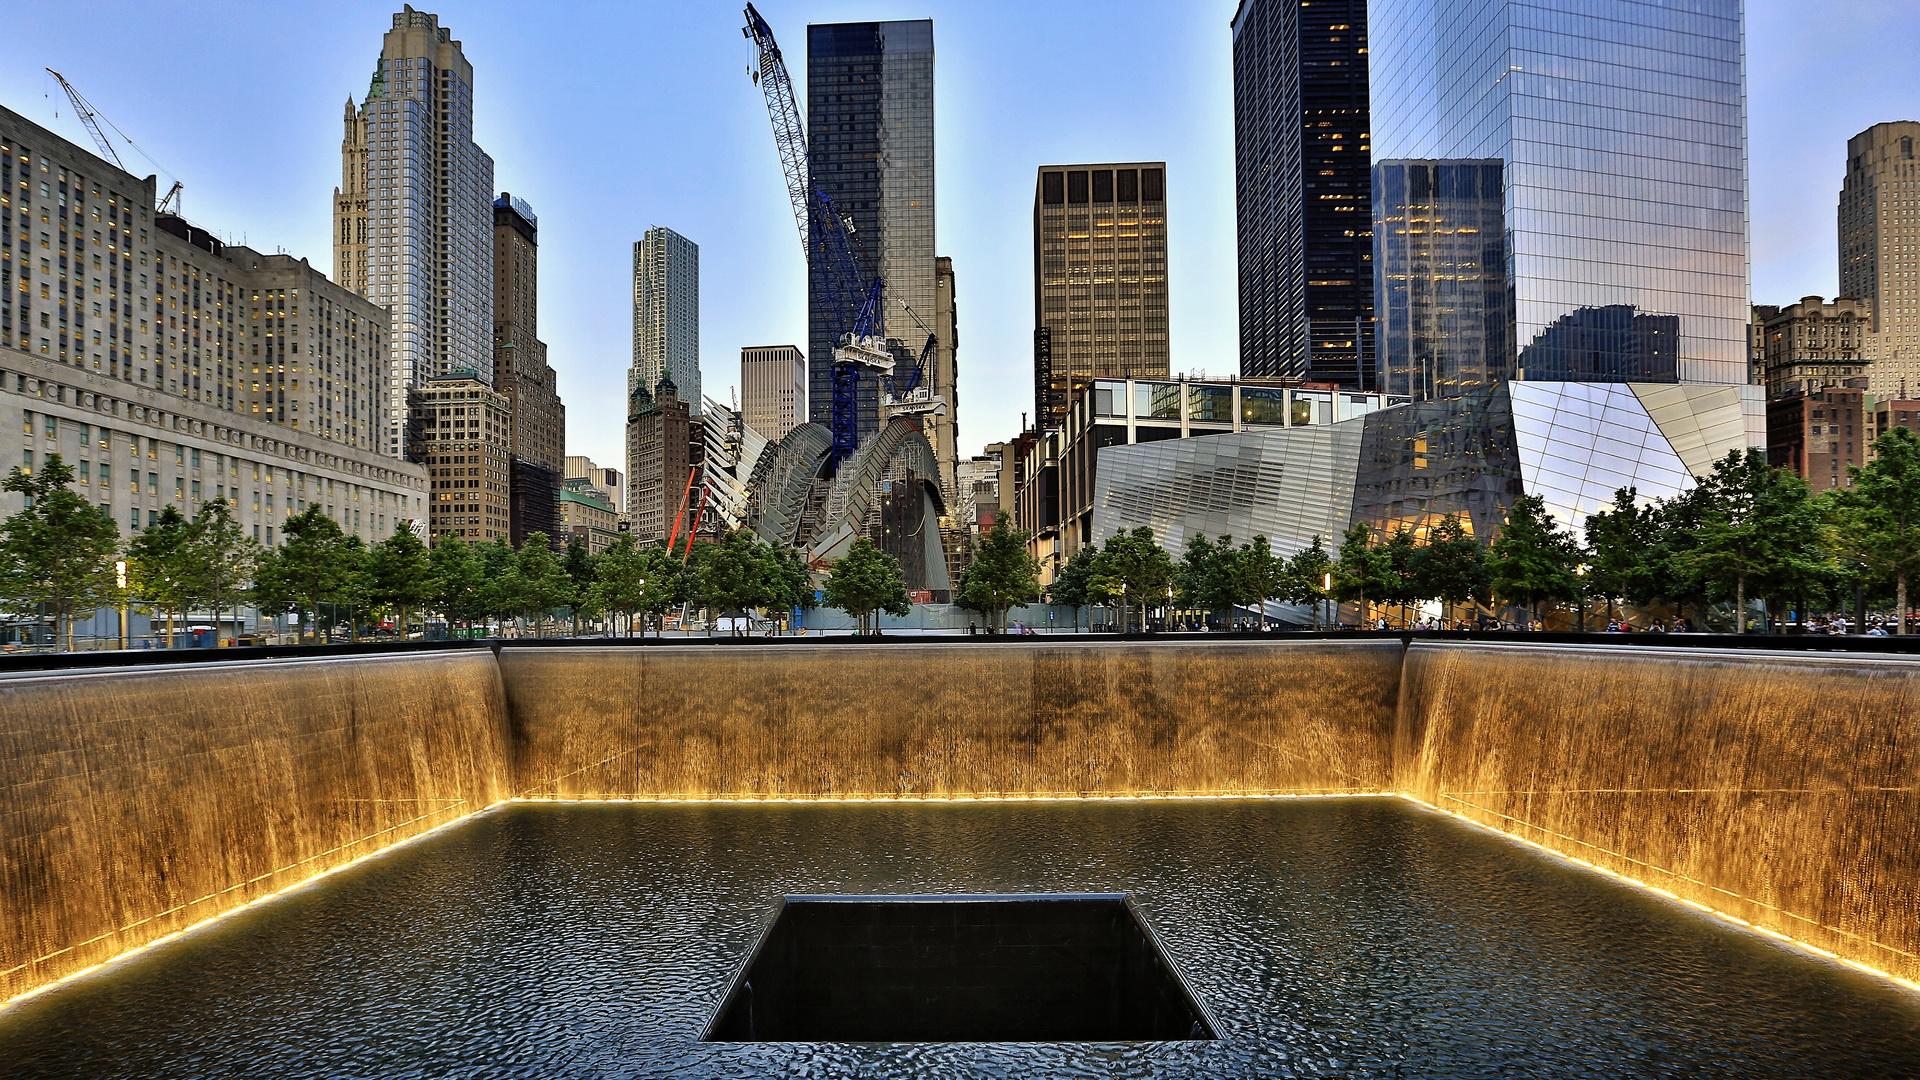 911 Memorial in New York City (Manhattan)